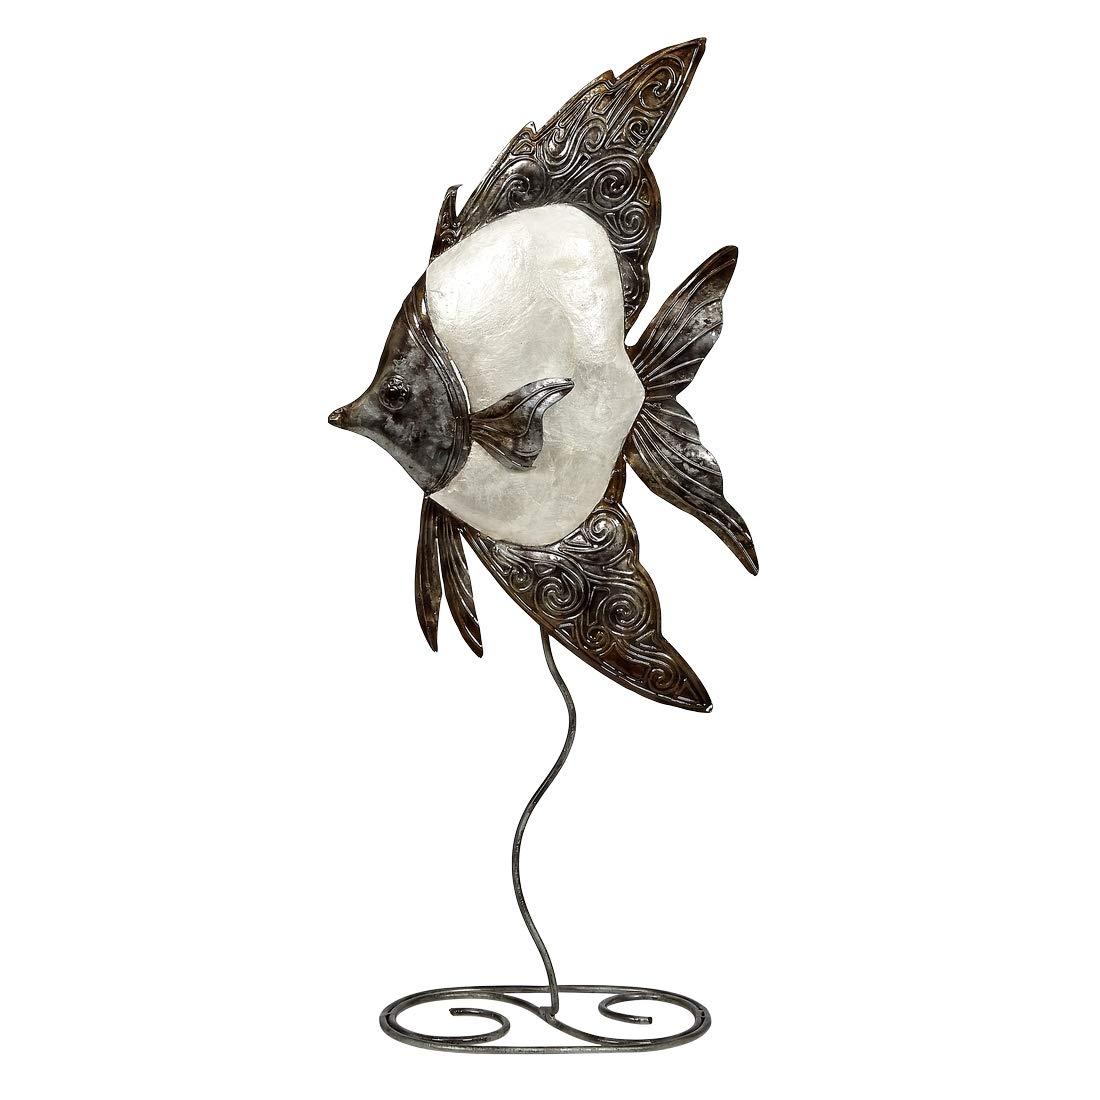 "Capiz Shell Art | Metal White Angelfish Sculpture on Stand | 9x20"" | Capiz Fish for Home Décor | Plus Free Nautical eBook by Joseph Rains"